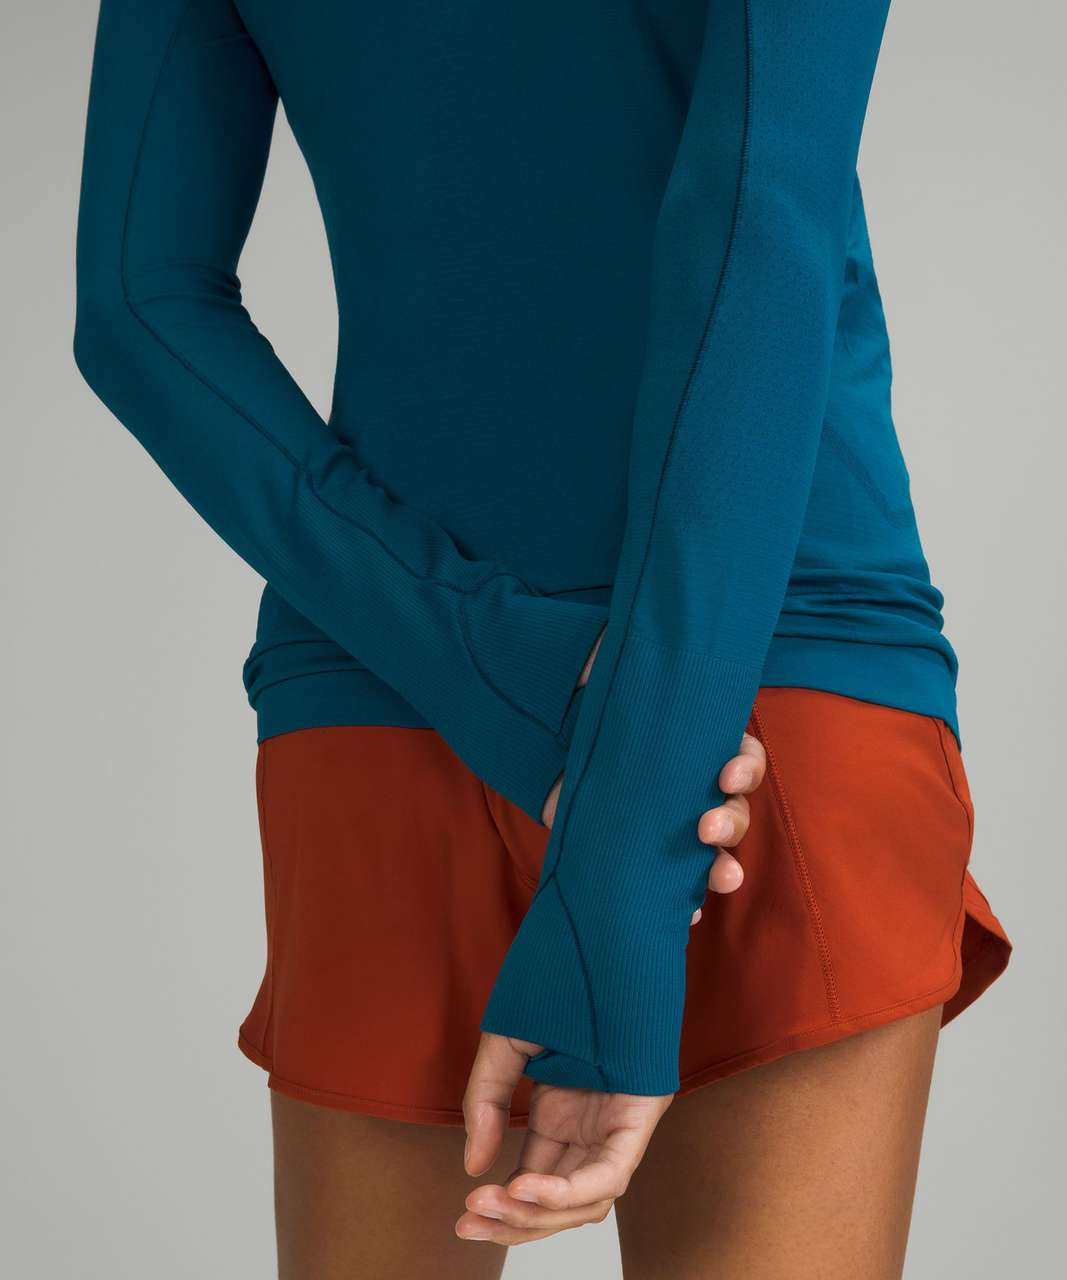 Lululemon Swiftly Tech Long Sleeve Shirt 2.0 - Capri / Capri